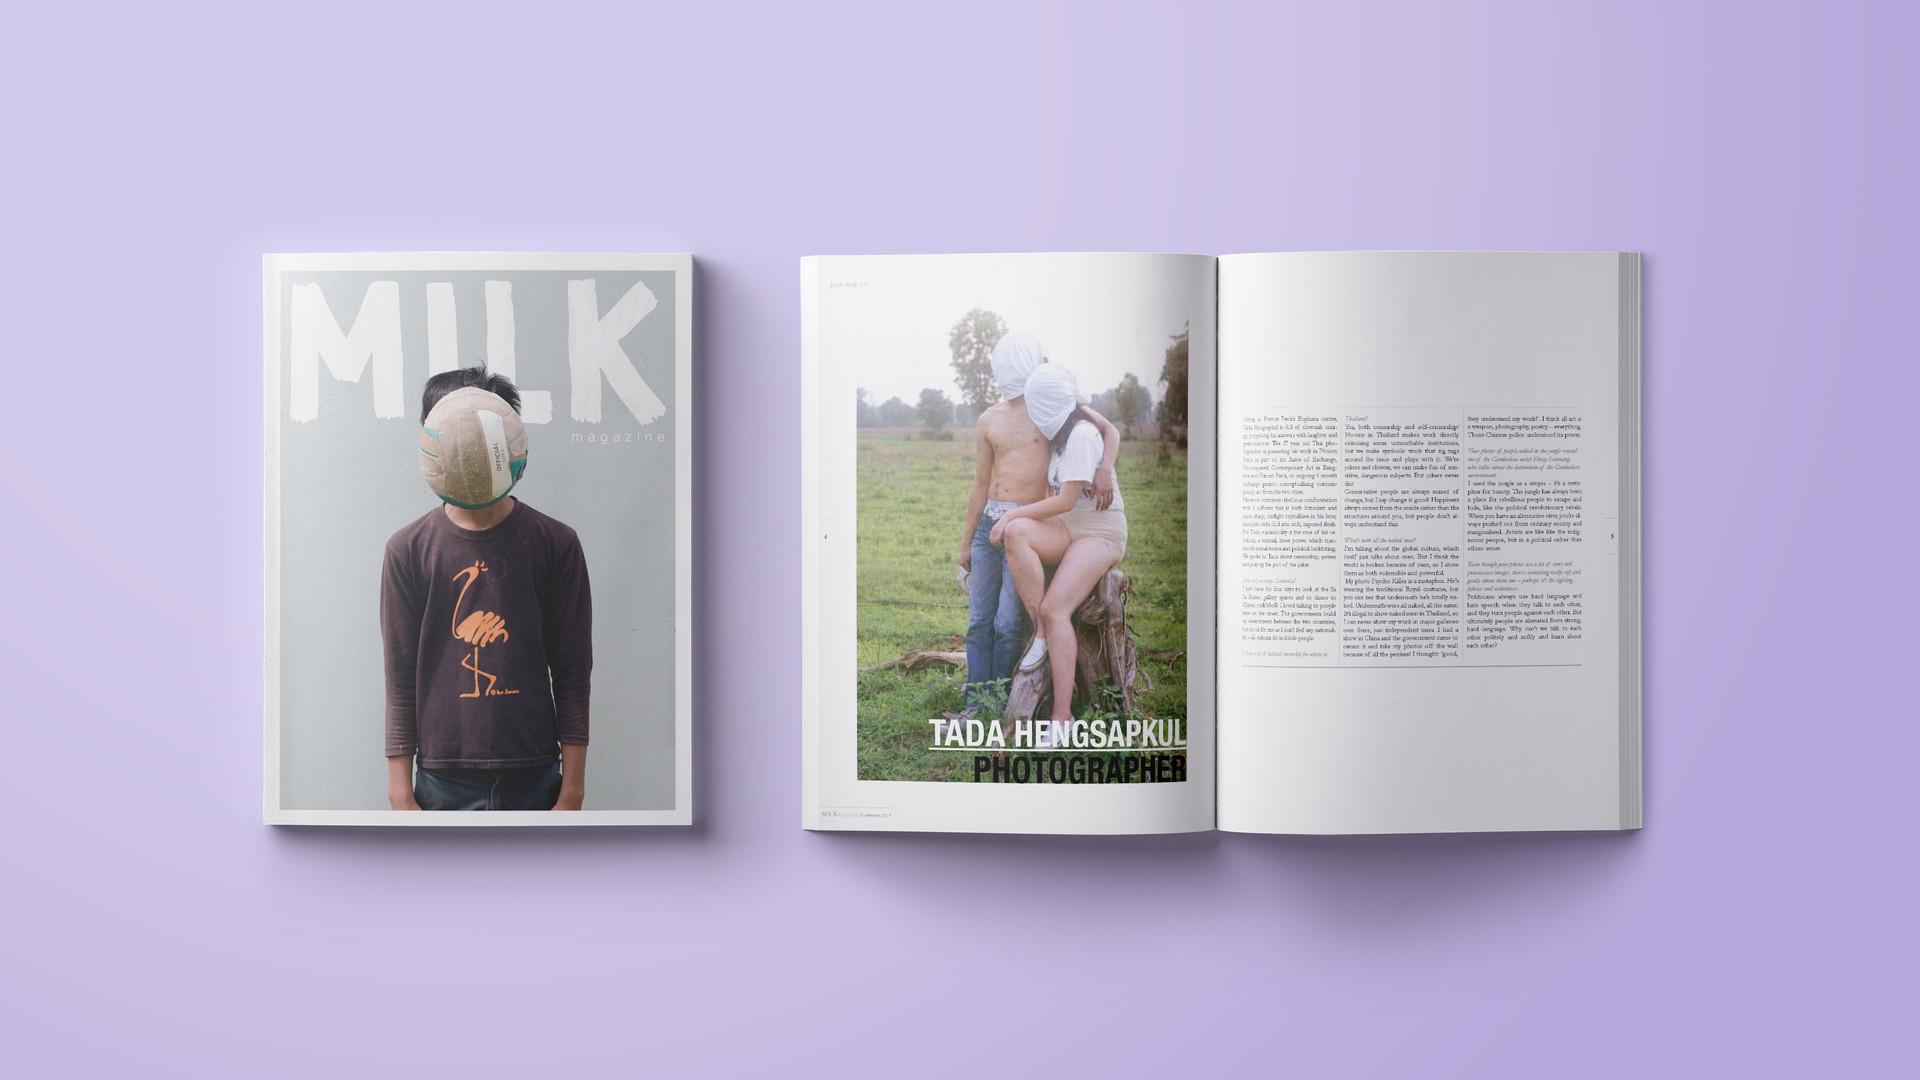 MILK-Magazine_2.jpg